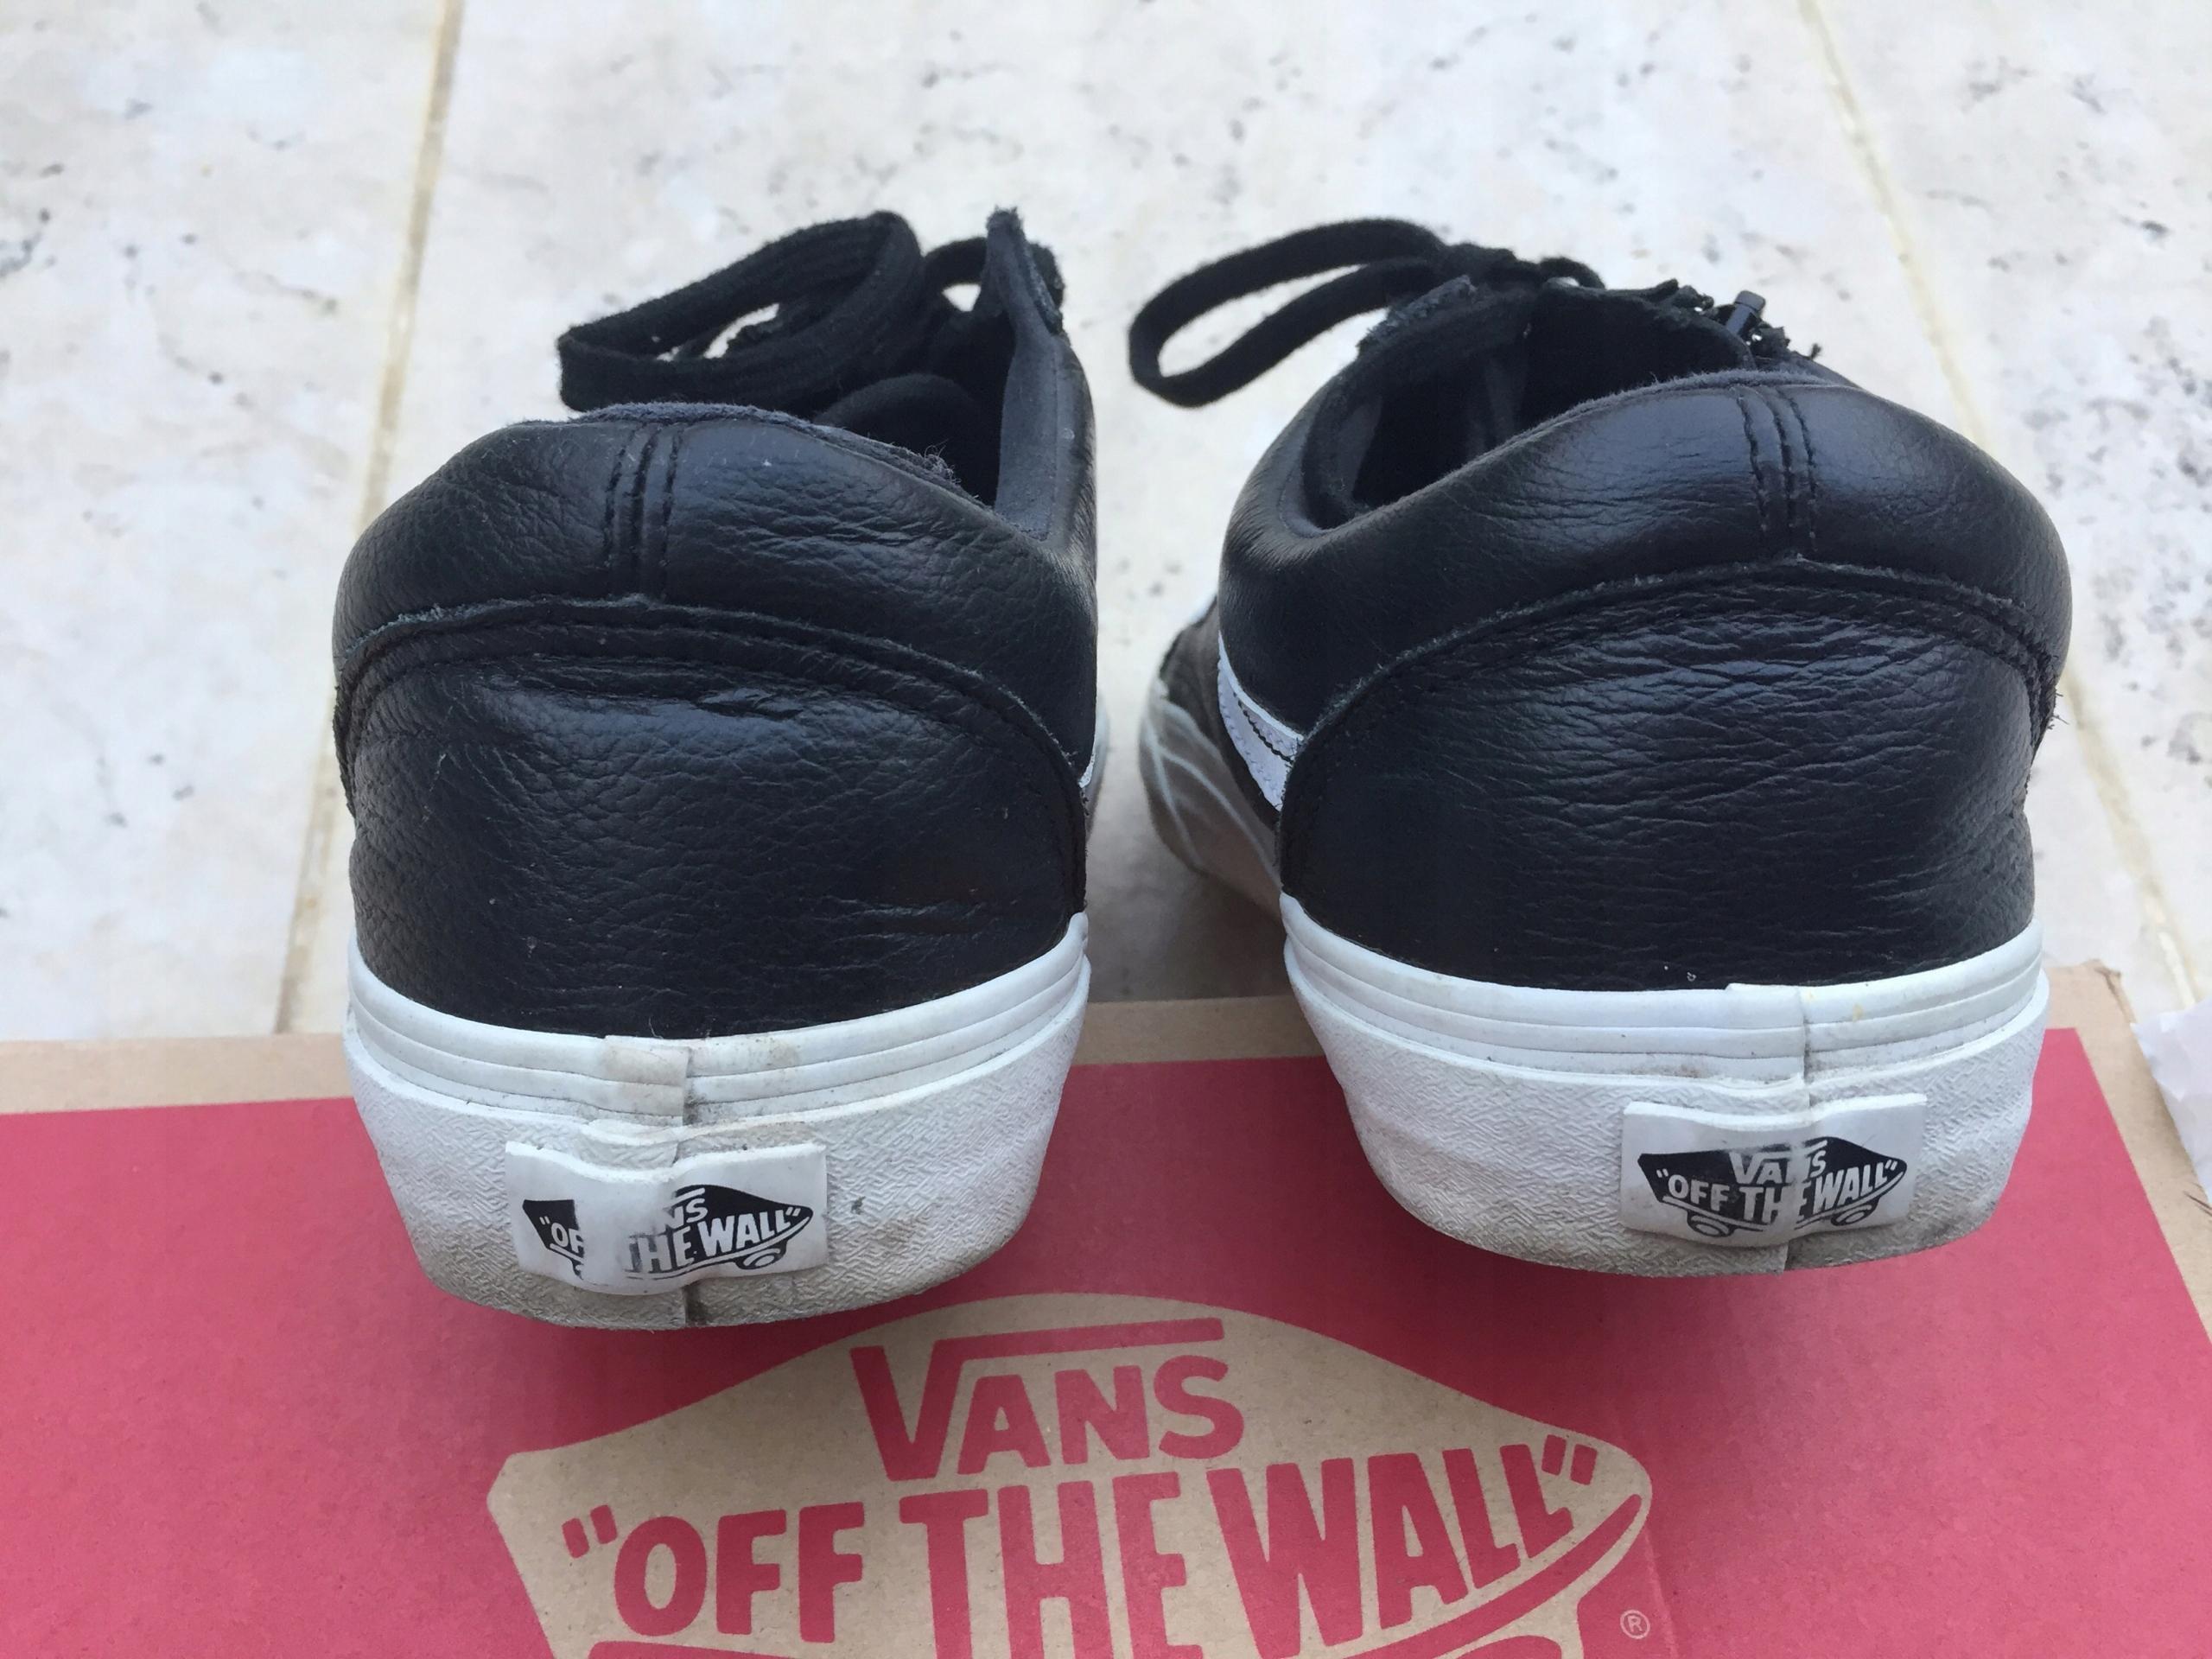 c7594e684f877 R Vans 7555611530 Czarne Buty Używane Old 40 Skóra Skool gwUpz